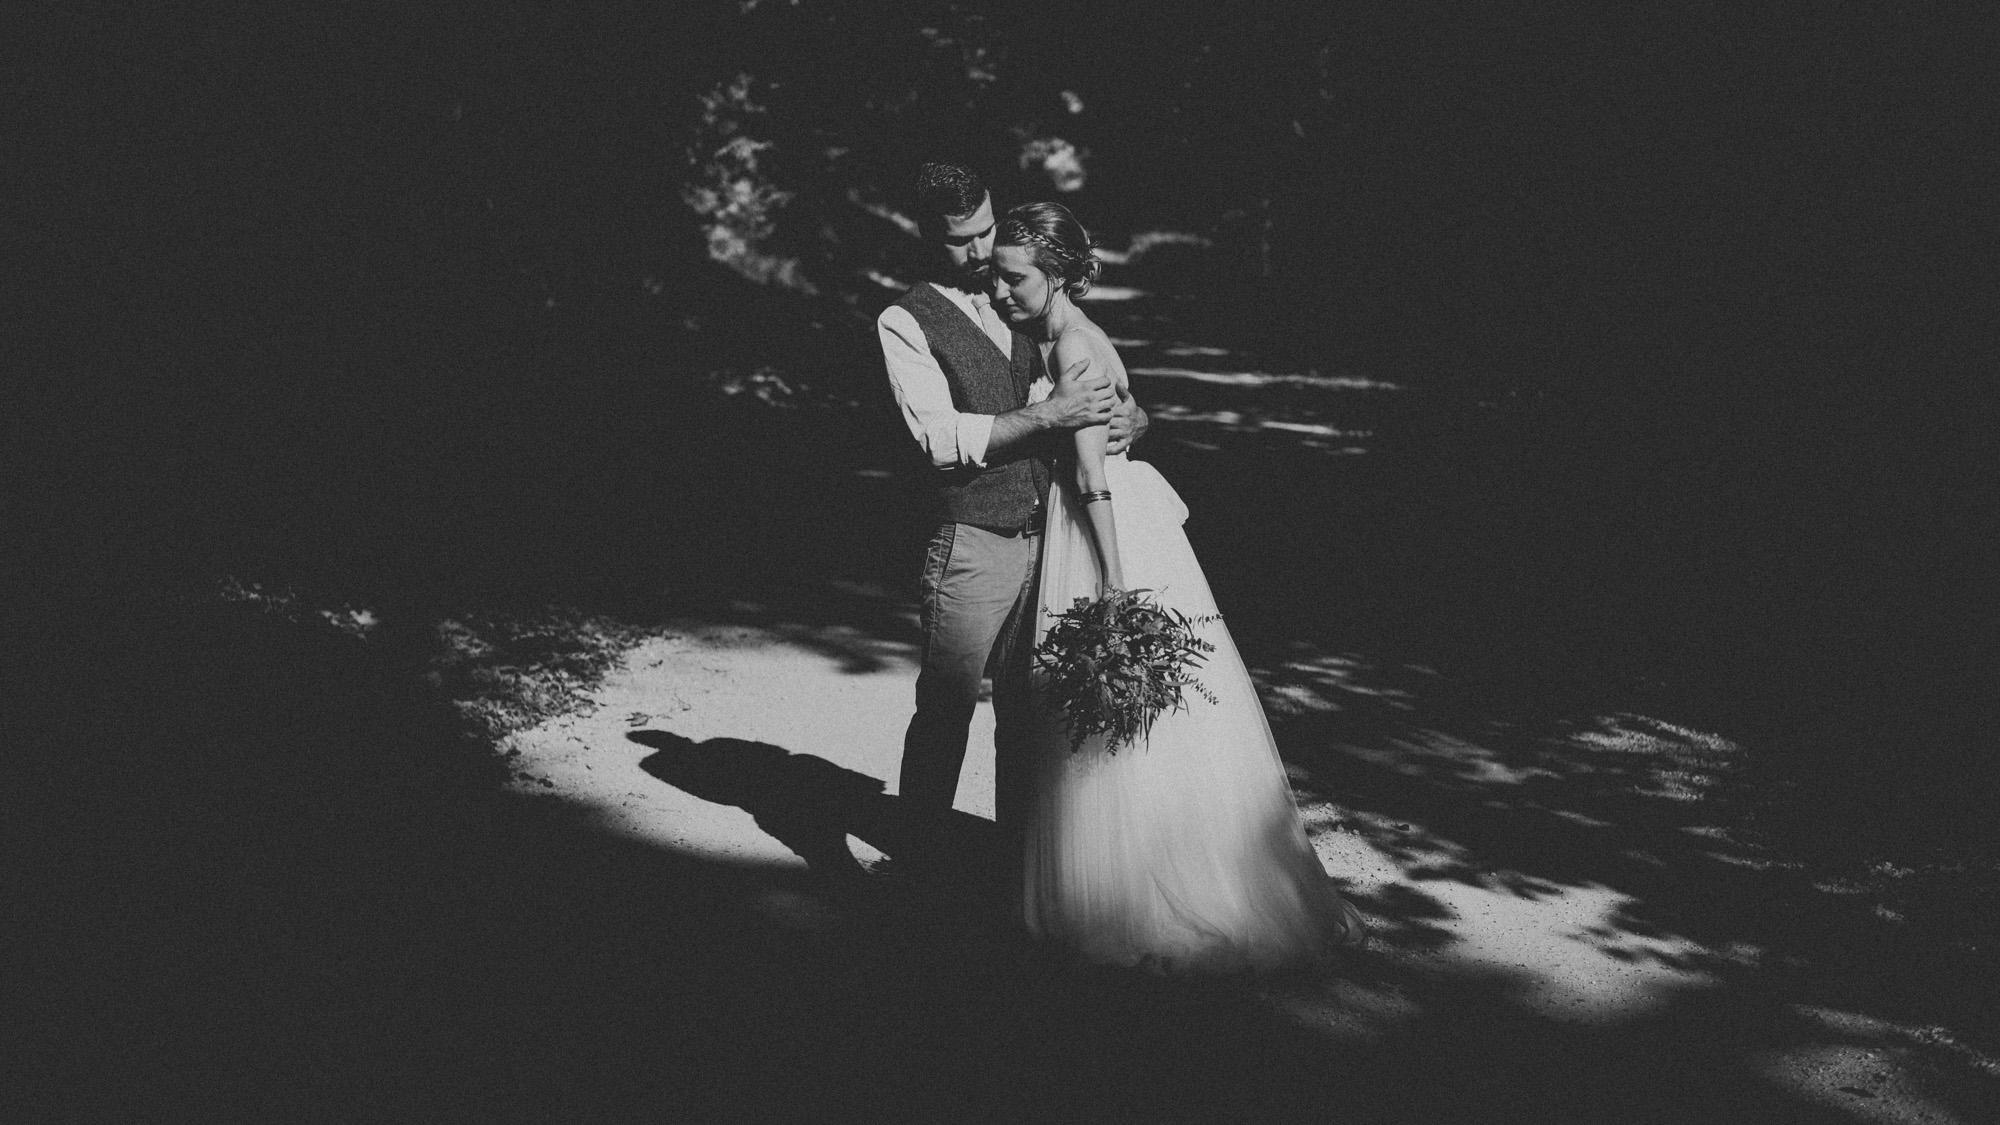 alec_vanderboom_springfield_missouri_wedding-0054.jpg